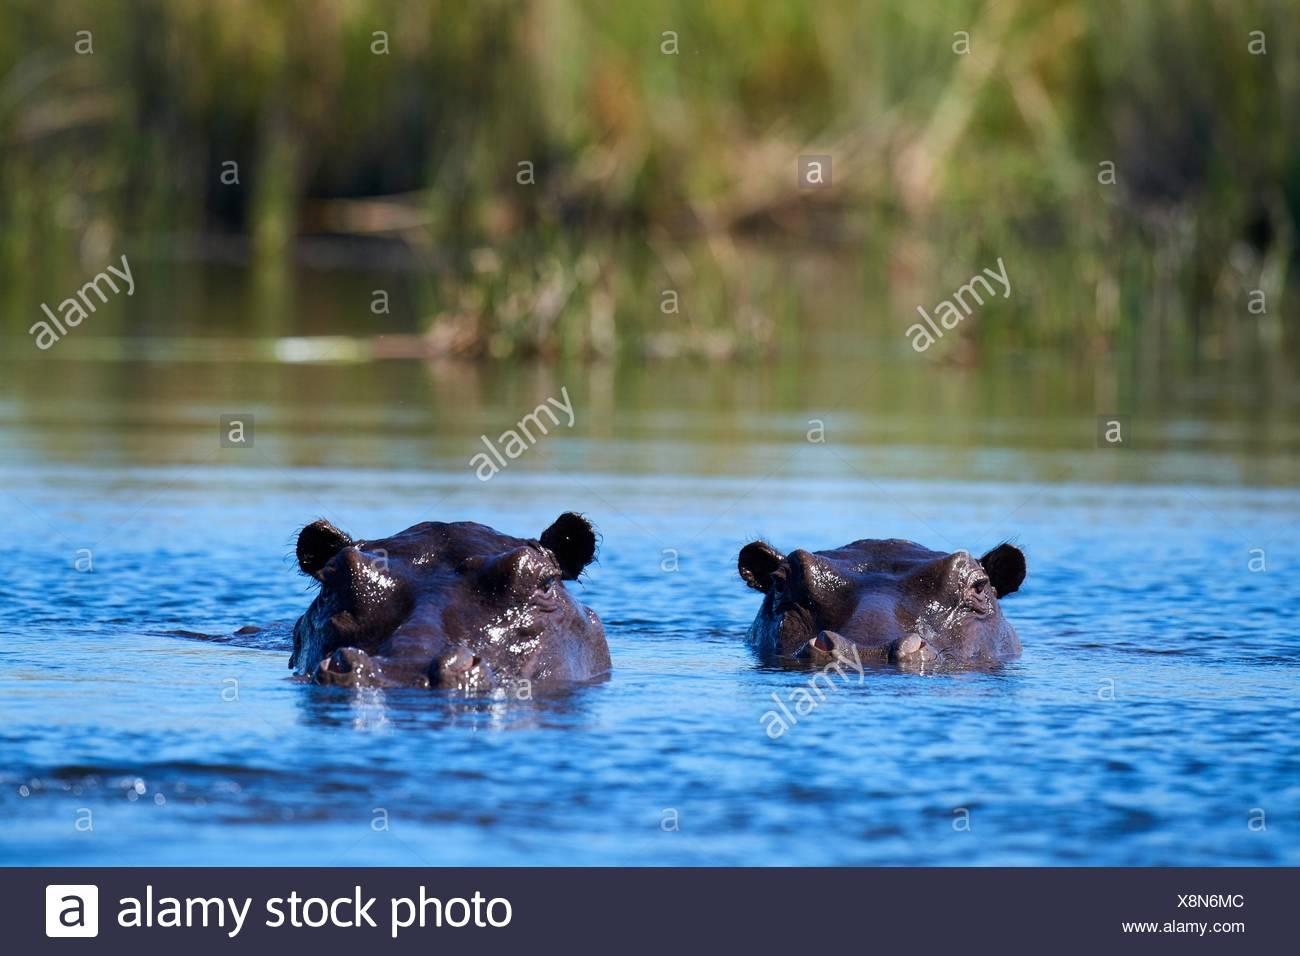 Hippopotamus (Hippopotamus amphibius) submerged in water. Moremi National Park, Okavango delta, Botswana, Southern Africa. - Stock Image